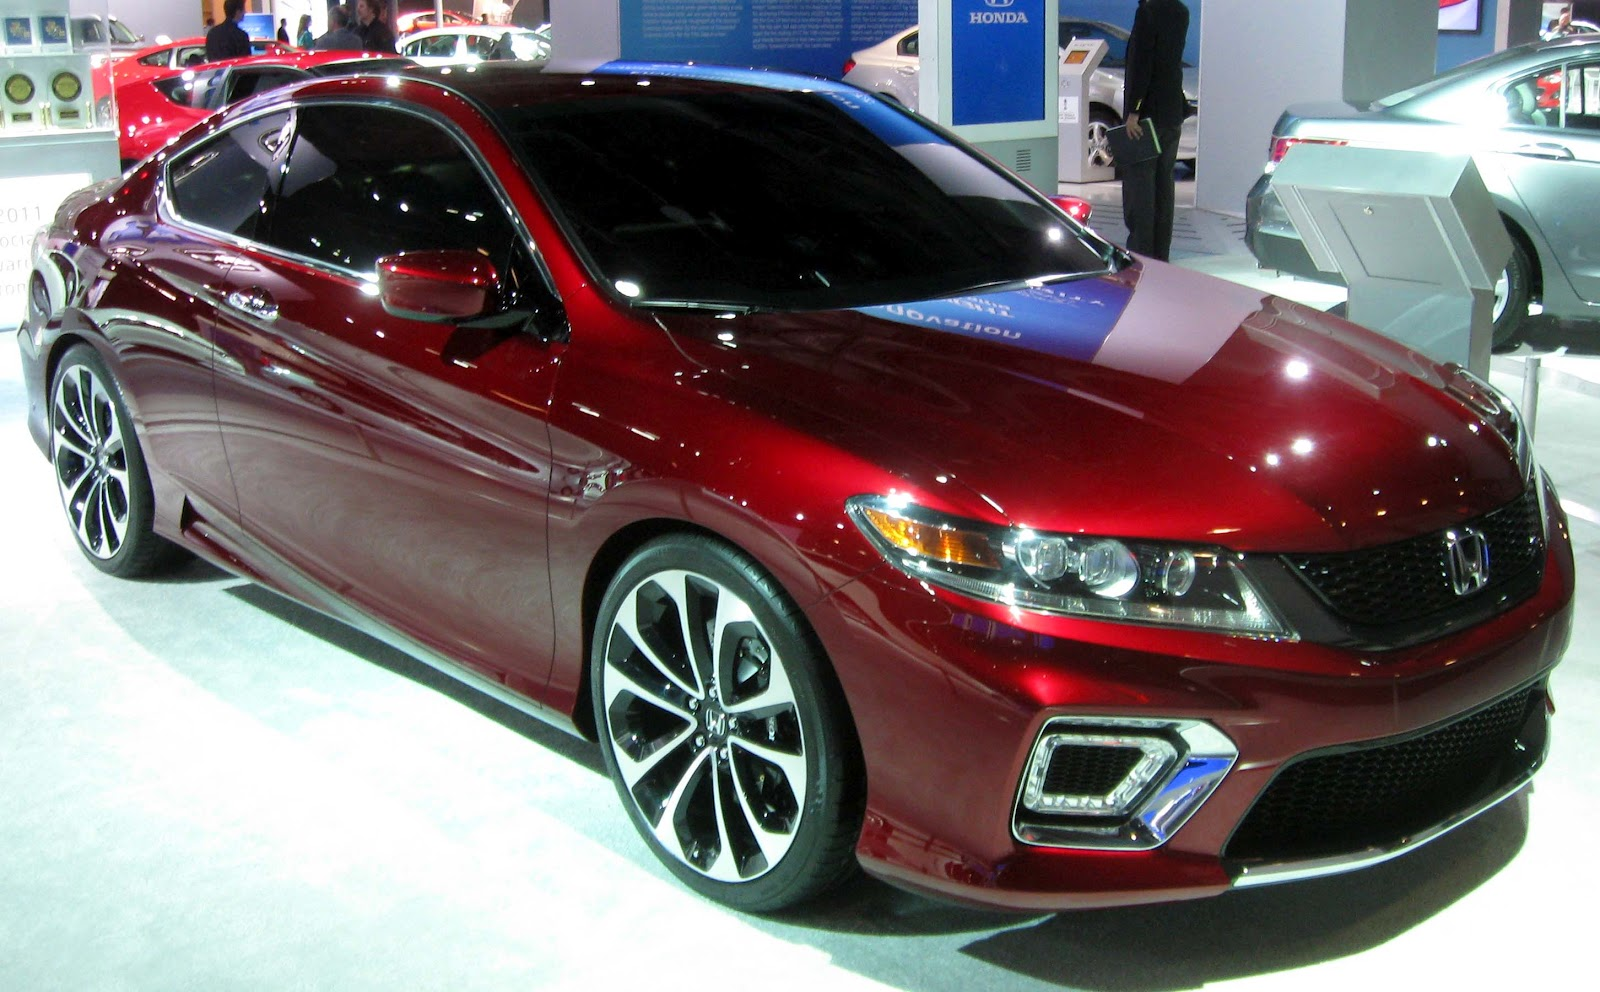 The Honda Accord 2013